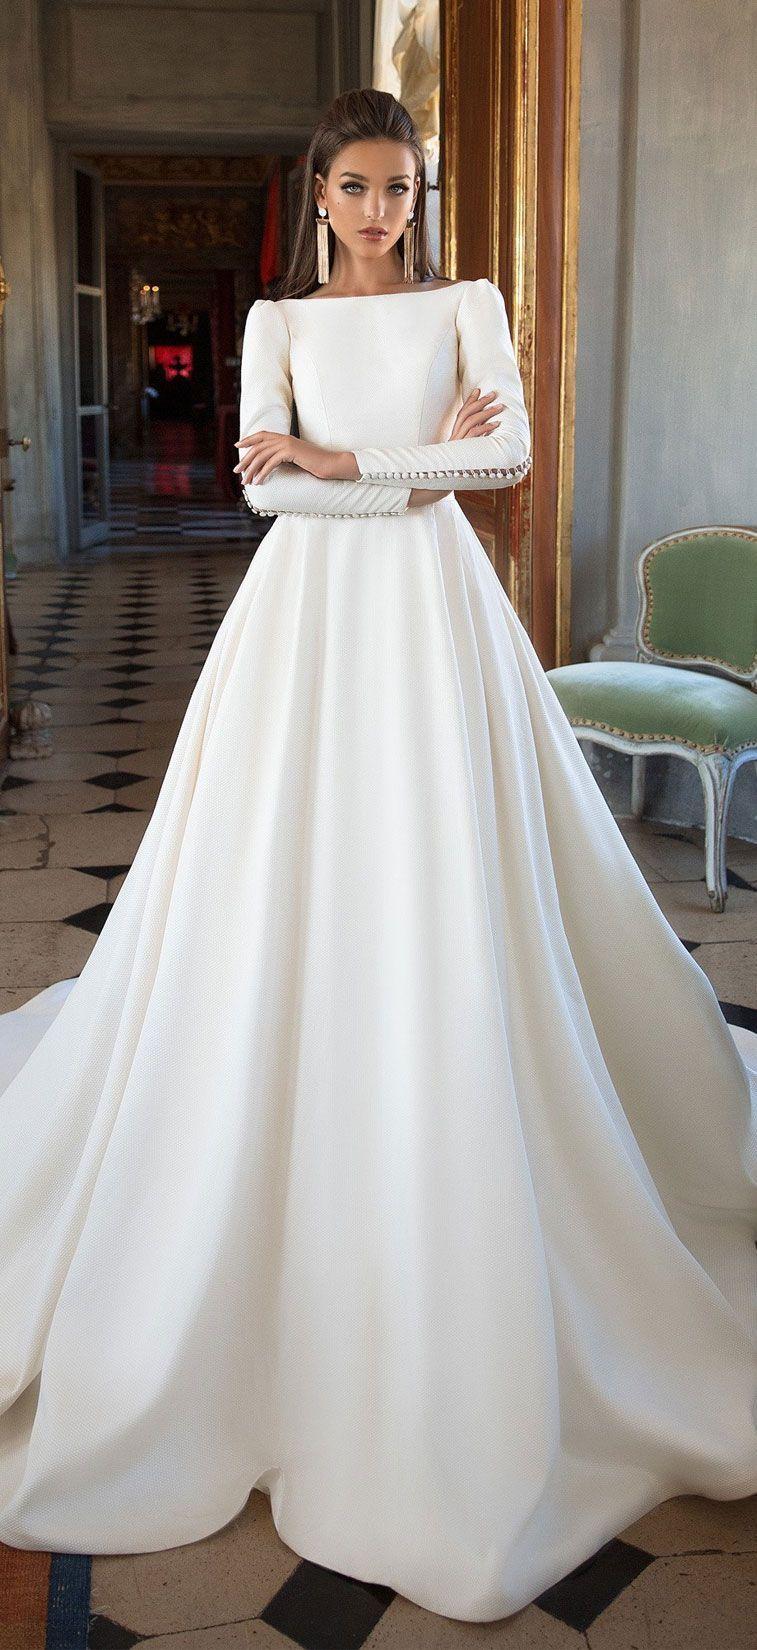 Milla nova wedding dress inspiration posen pinterest wedding